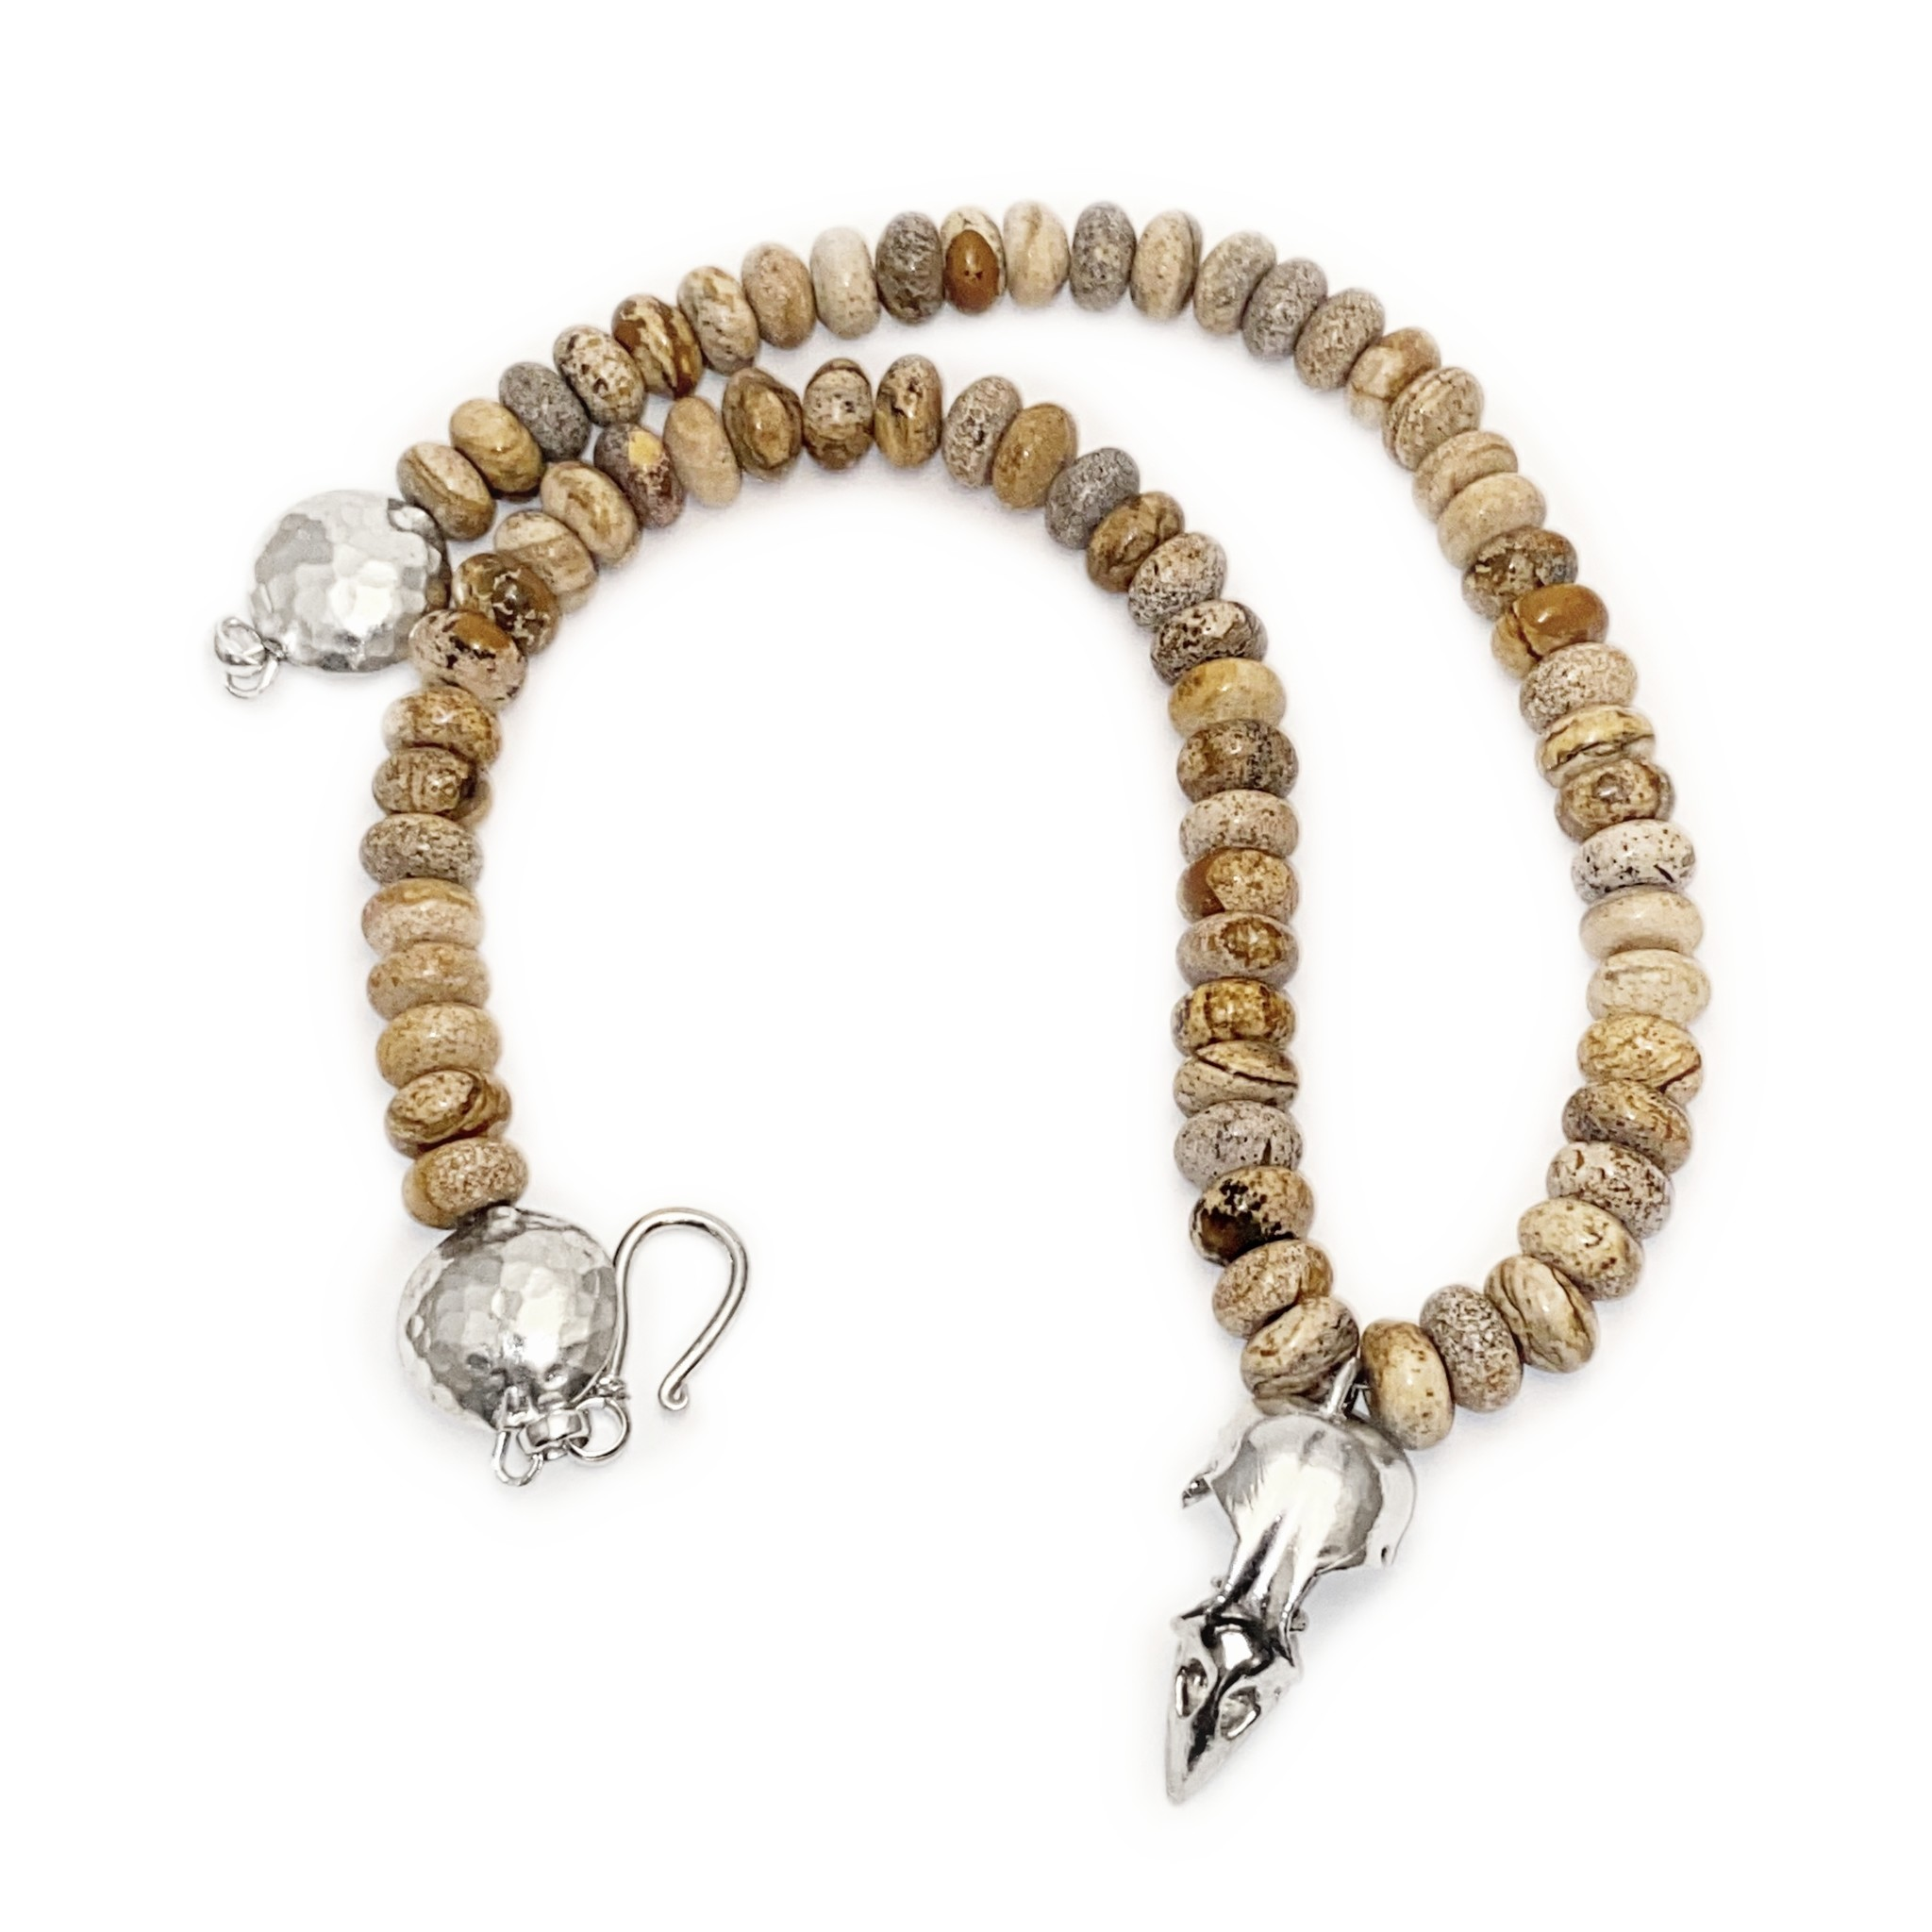 Bird Skull Pendant Necklace - Sterling Silver